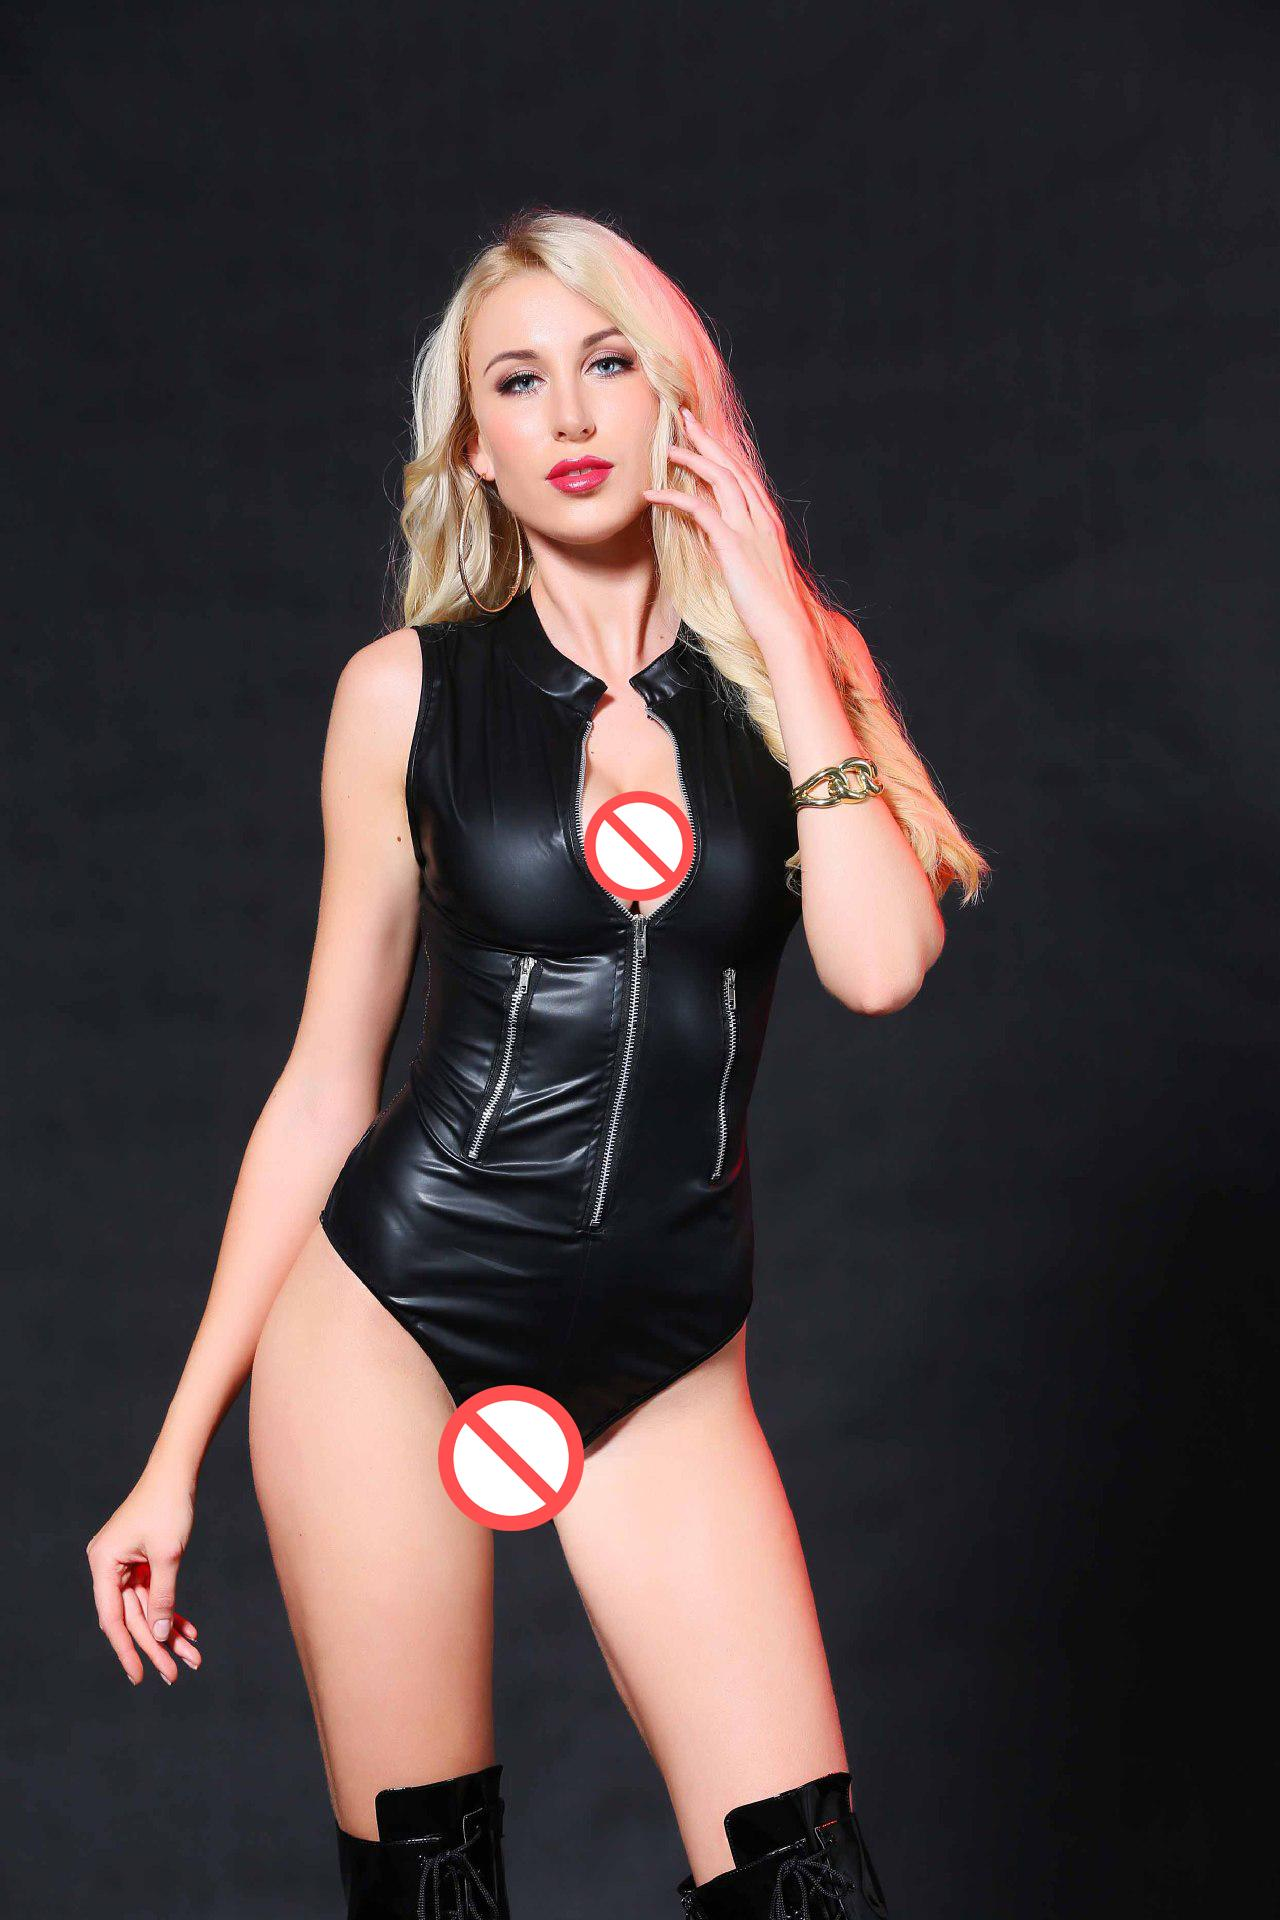 Amateur girl fingering her pussy